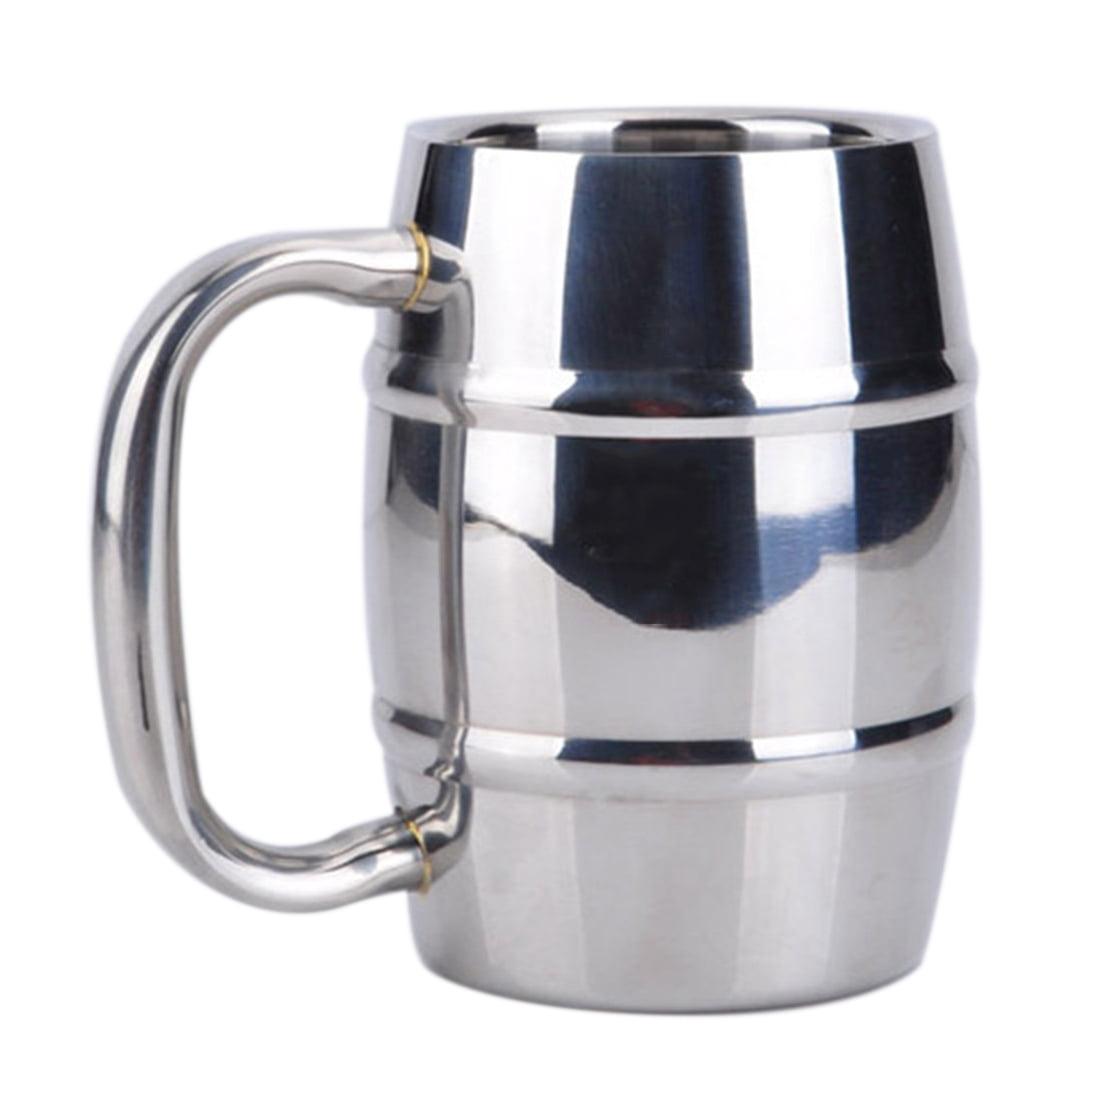 300ML Stainless Steel Beer Mug Double Wall Air Insulated Beer Beverage Mug Coffee Cup by